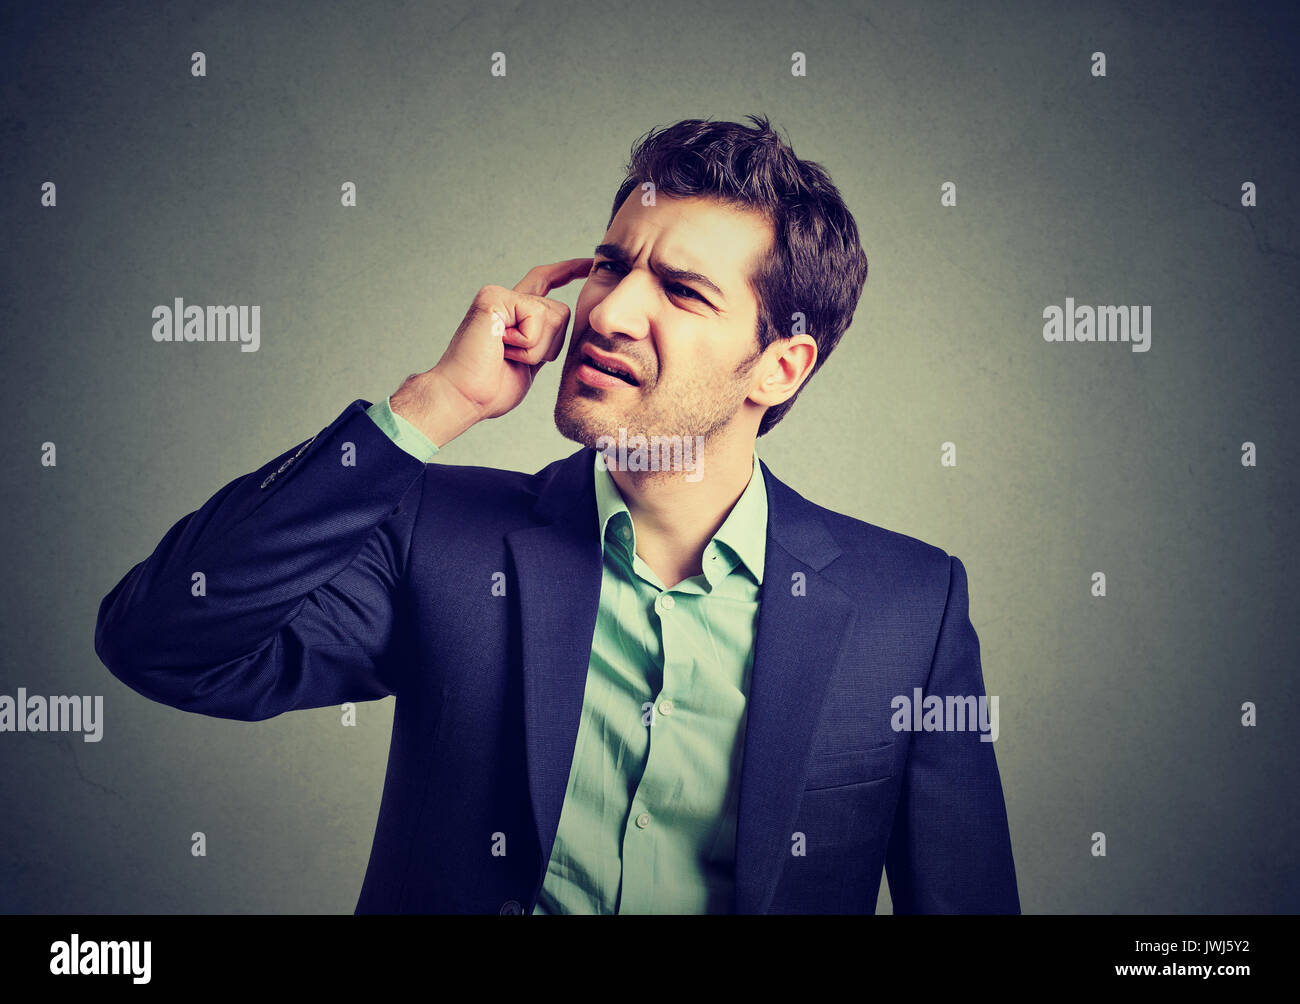 Verwirrt Geschäftsmann denken den Kopf kratzen Stockbild